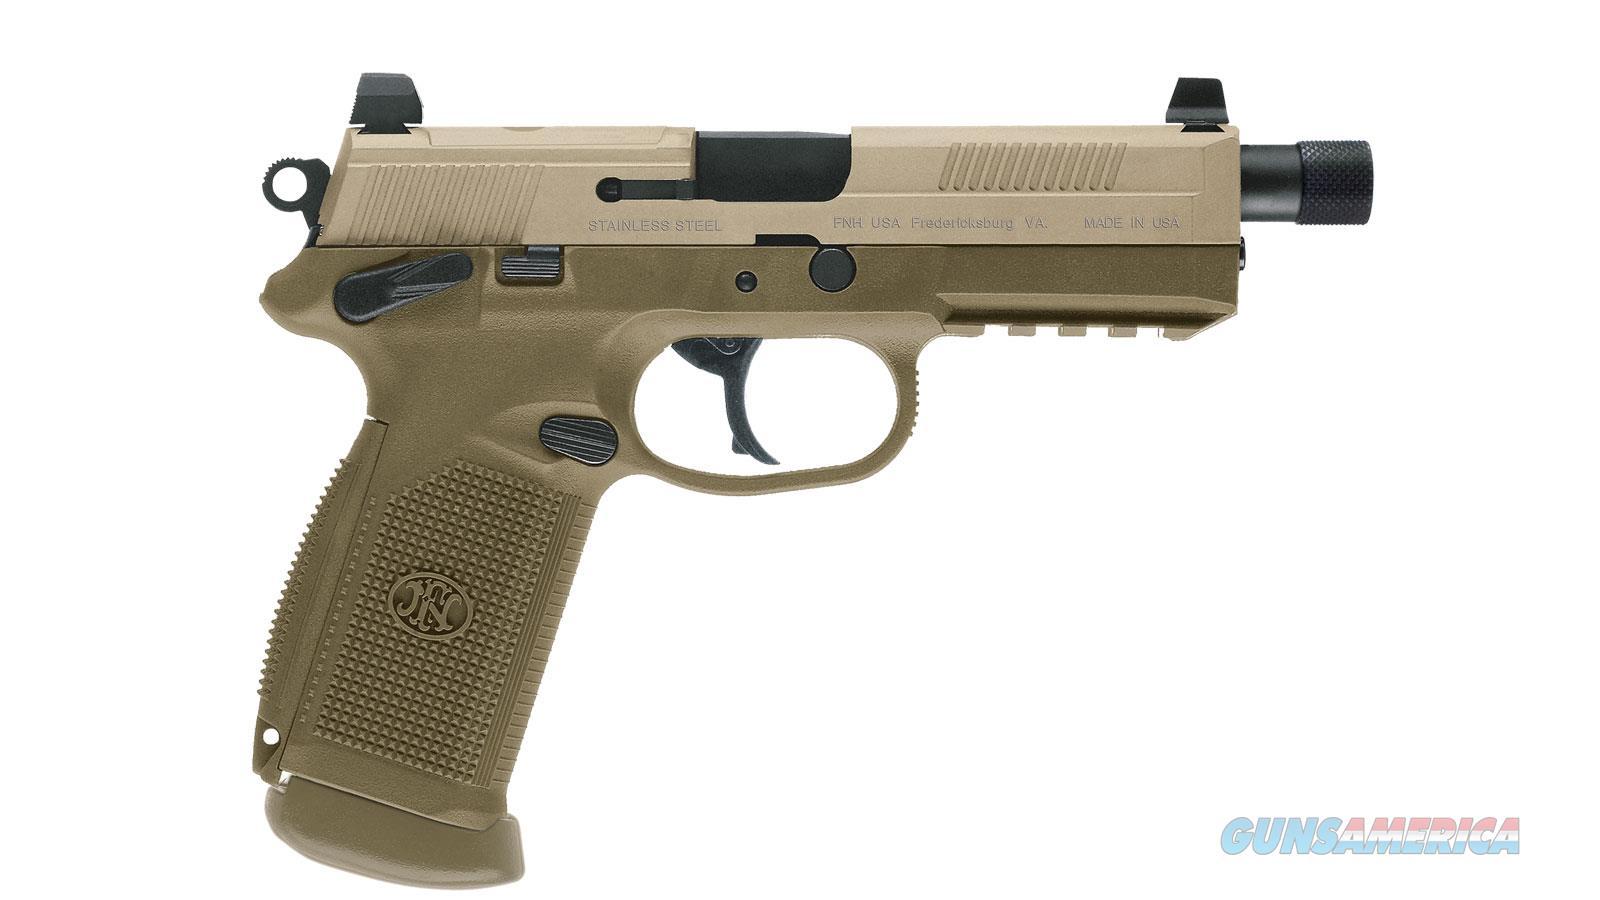 "Fn 66968 Fnx 45 Tactical 45 Acp Single/Double 5.3"" 15+1 Flat Dark Earth Interchangeable Backstrap Grip Flat Dark Earth Stainless Steel Slide 66968  Guns > Pistols > F Misc Pistols"